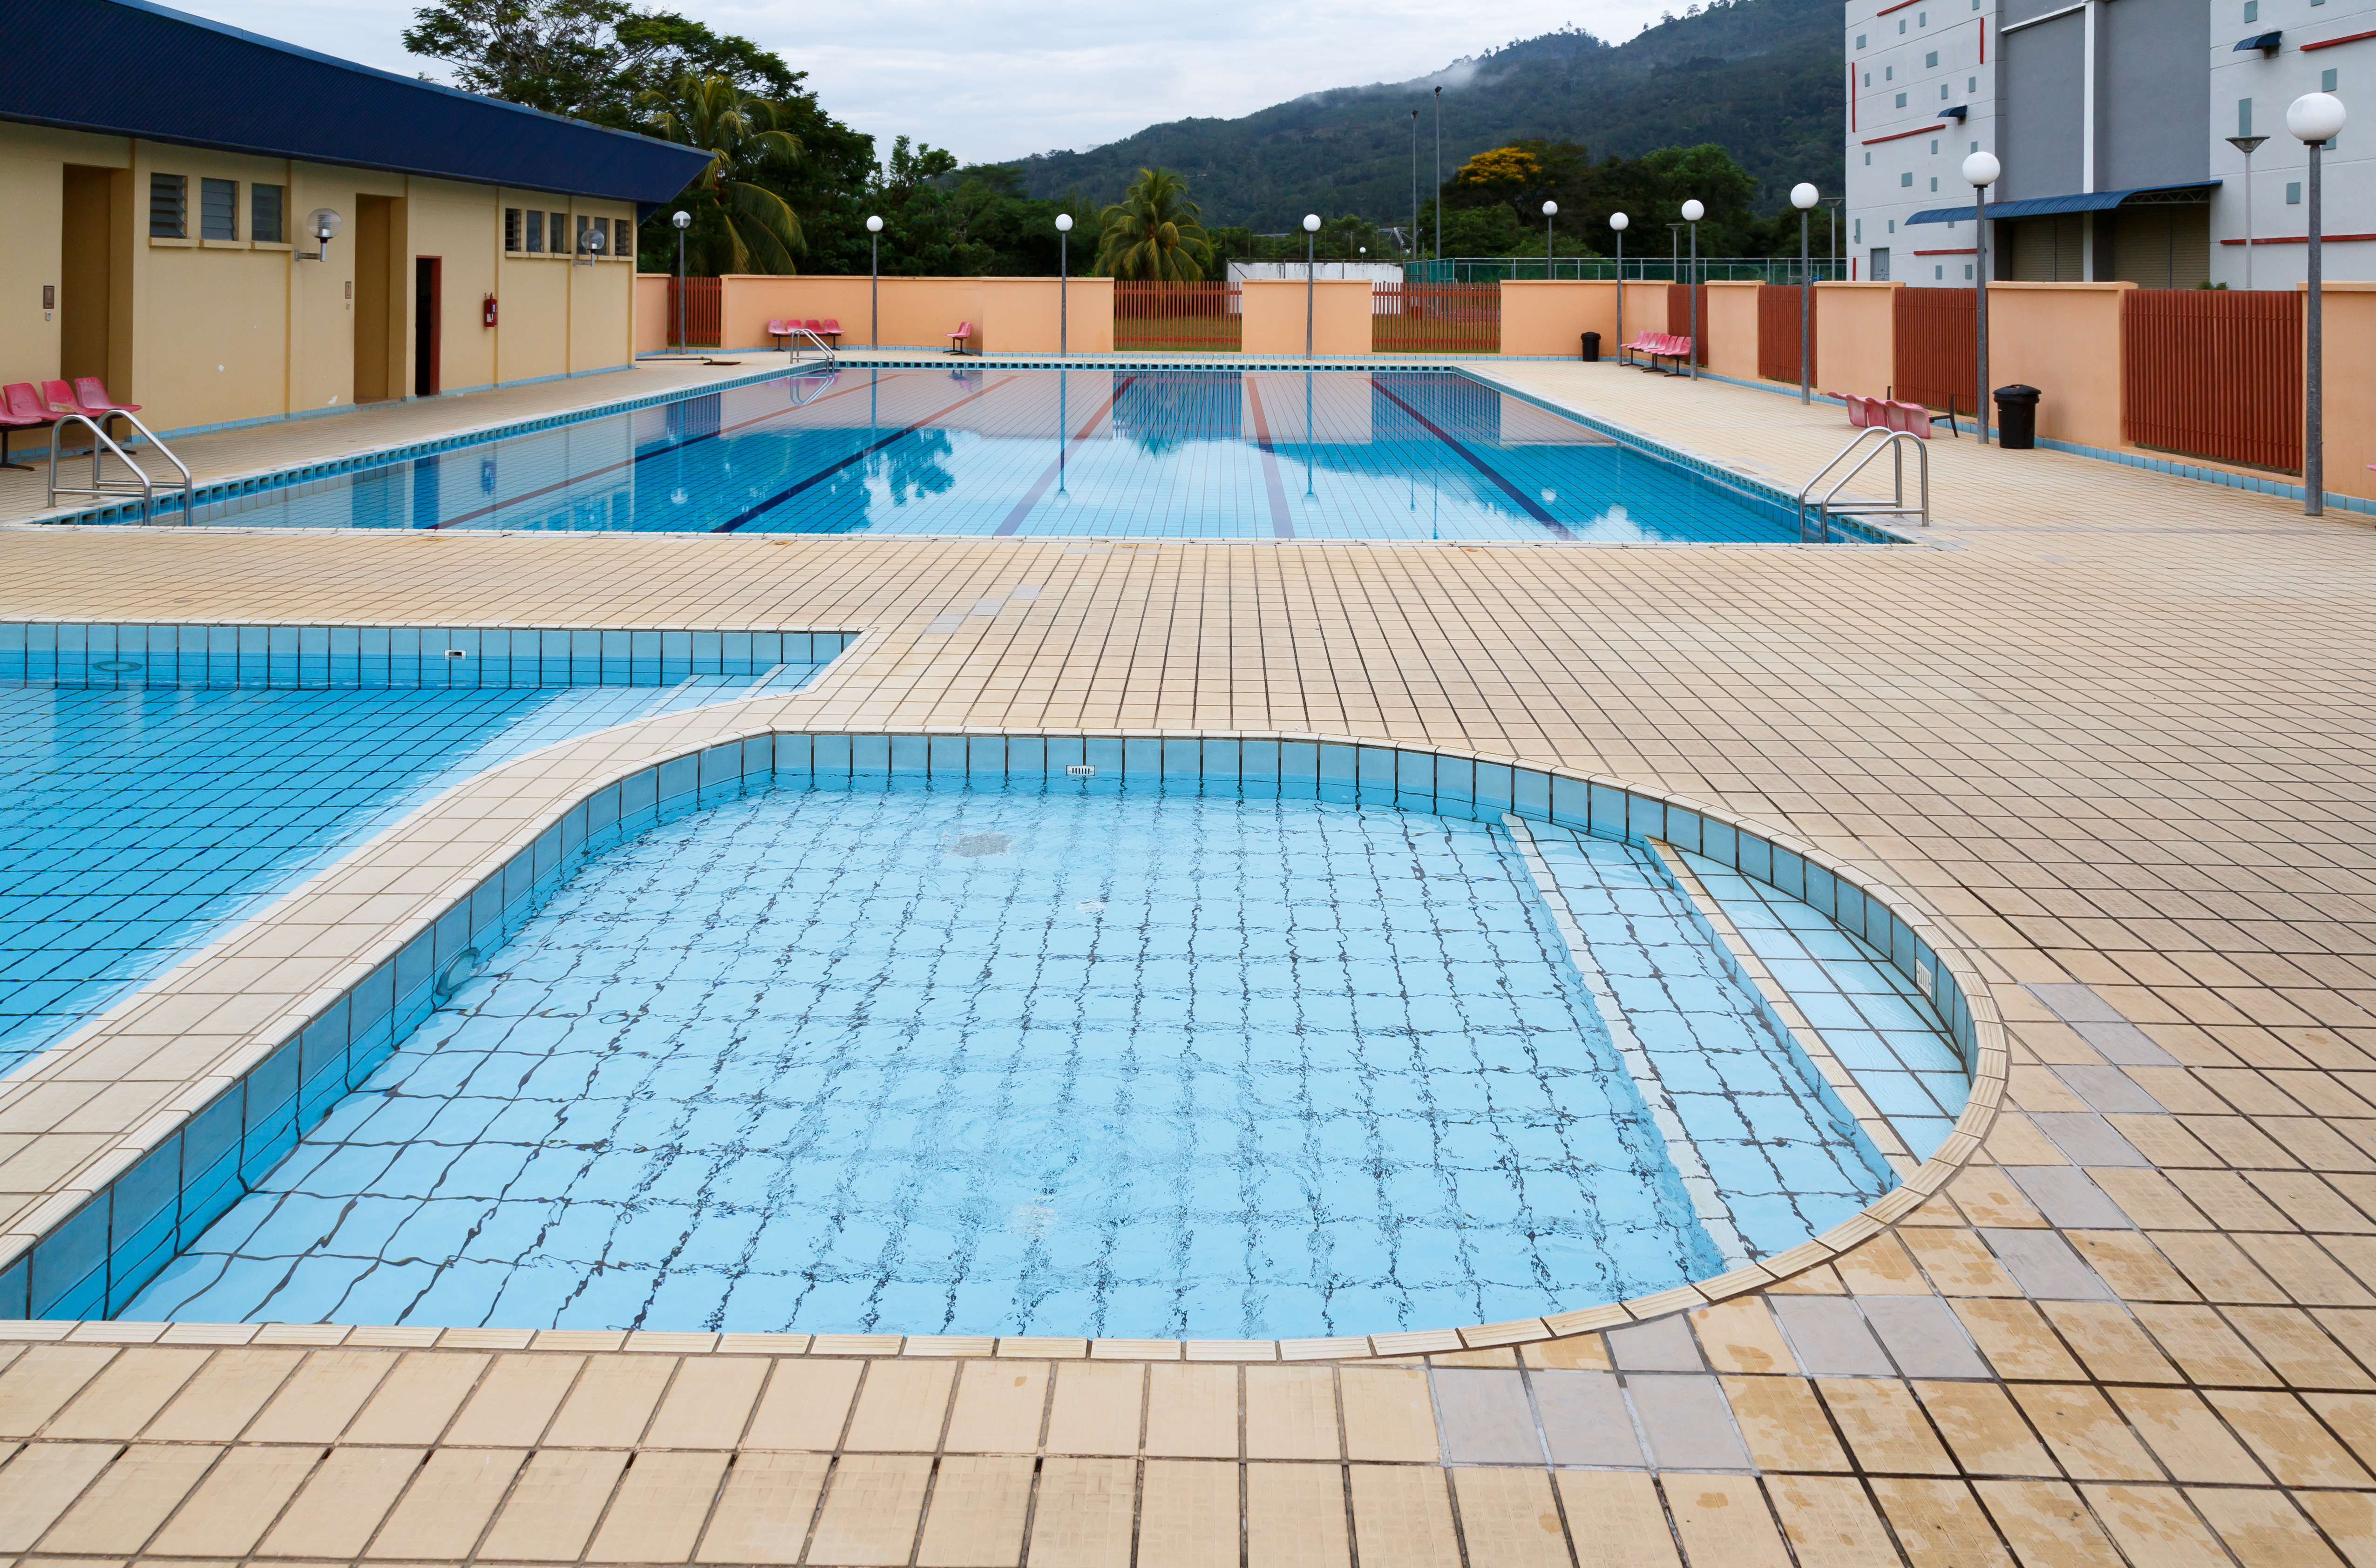 File Tenom Sabah Outdoor Swimming Pool 10 Jpg Wikimedia Commons